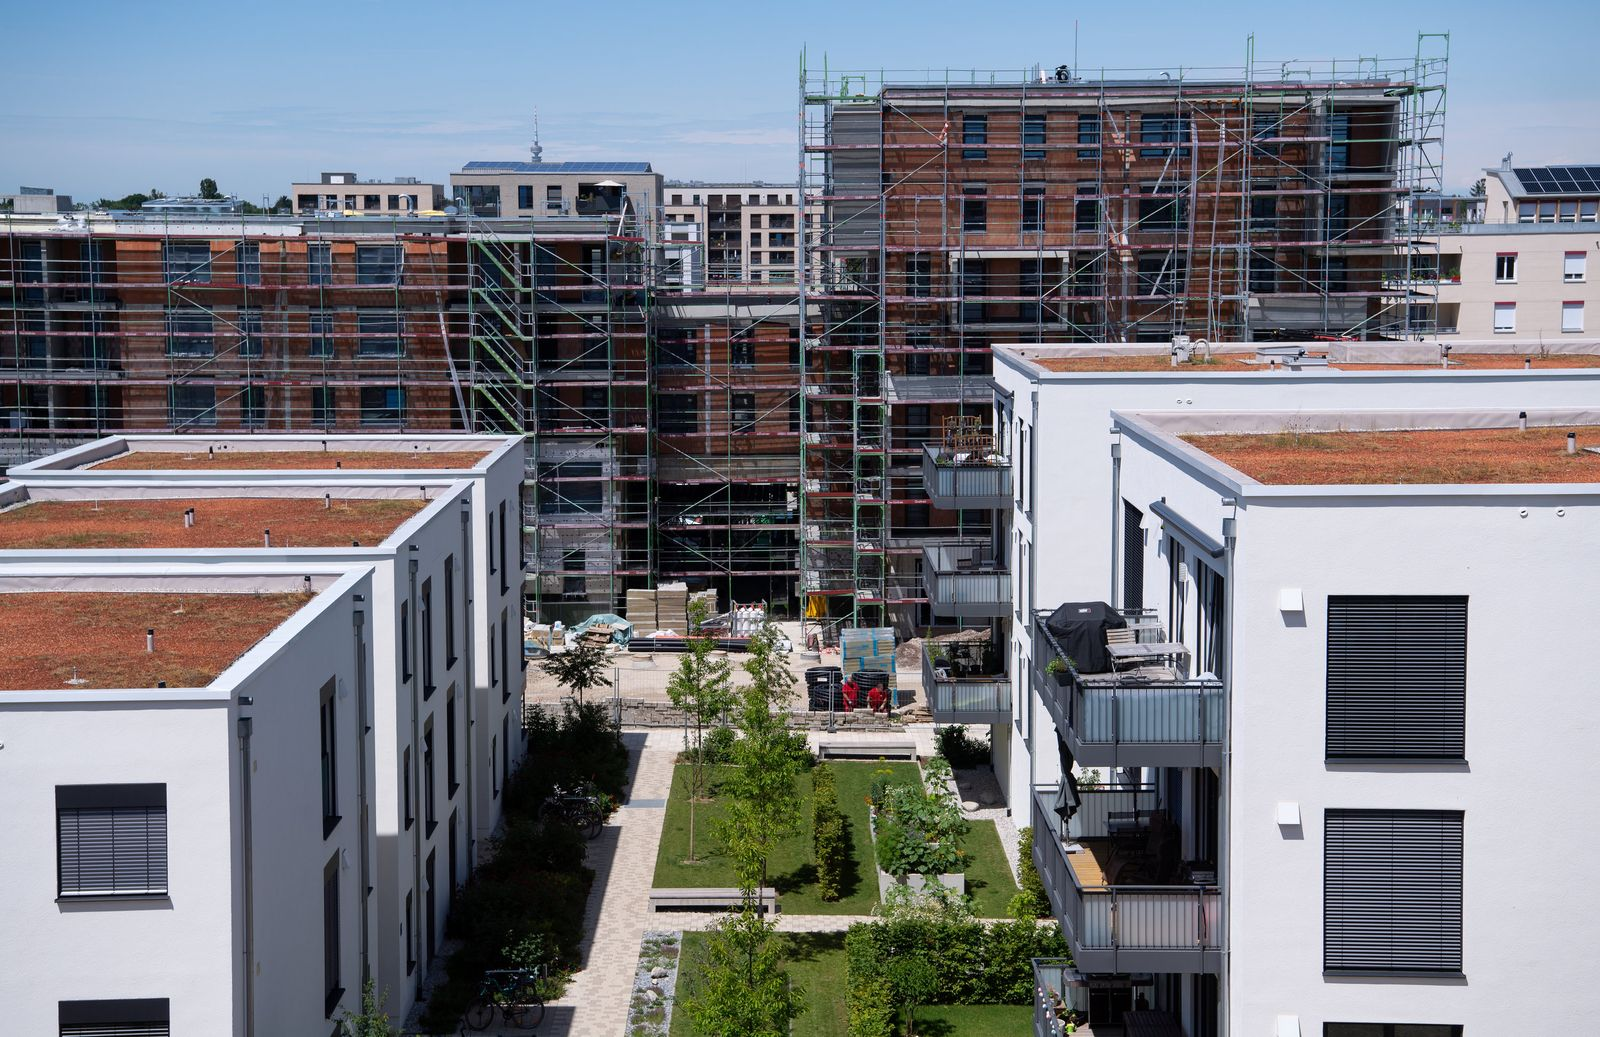 Neubaugebiet - Stadtentwicklung